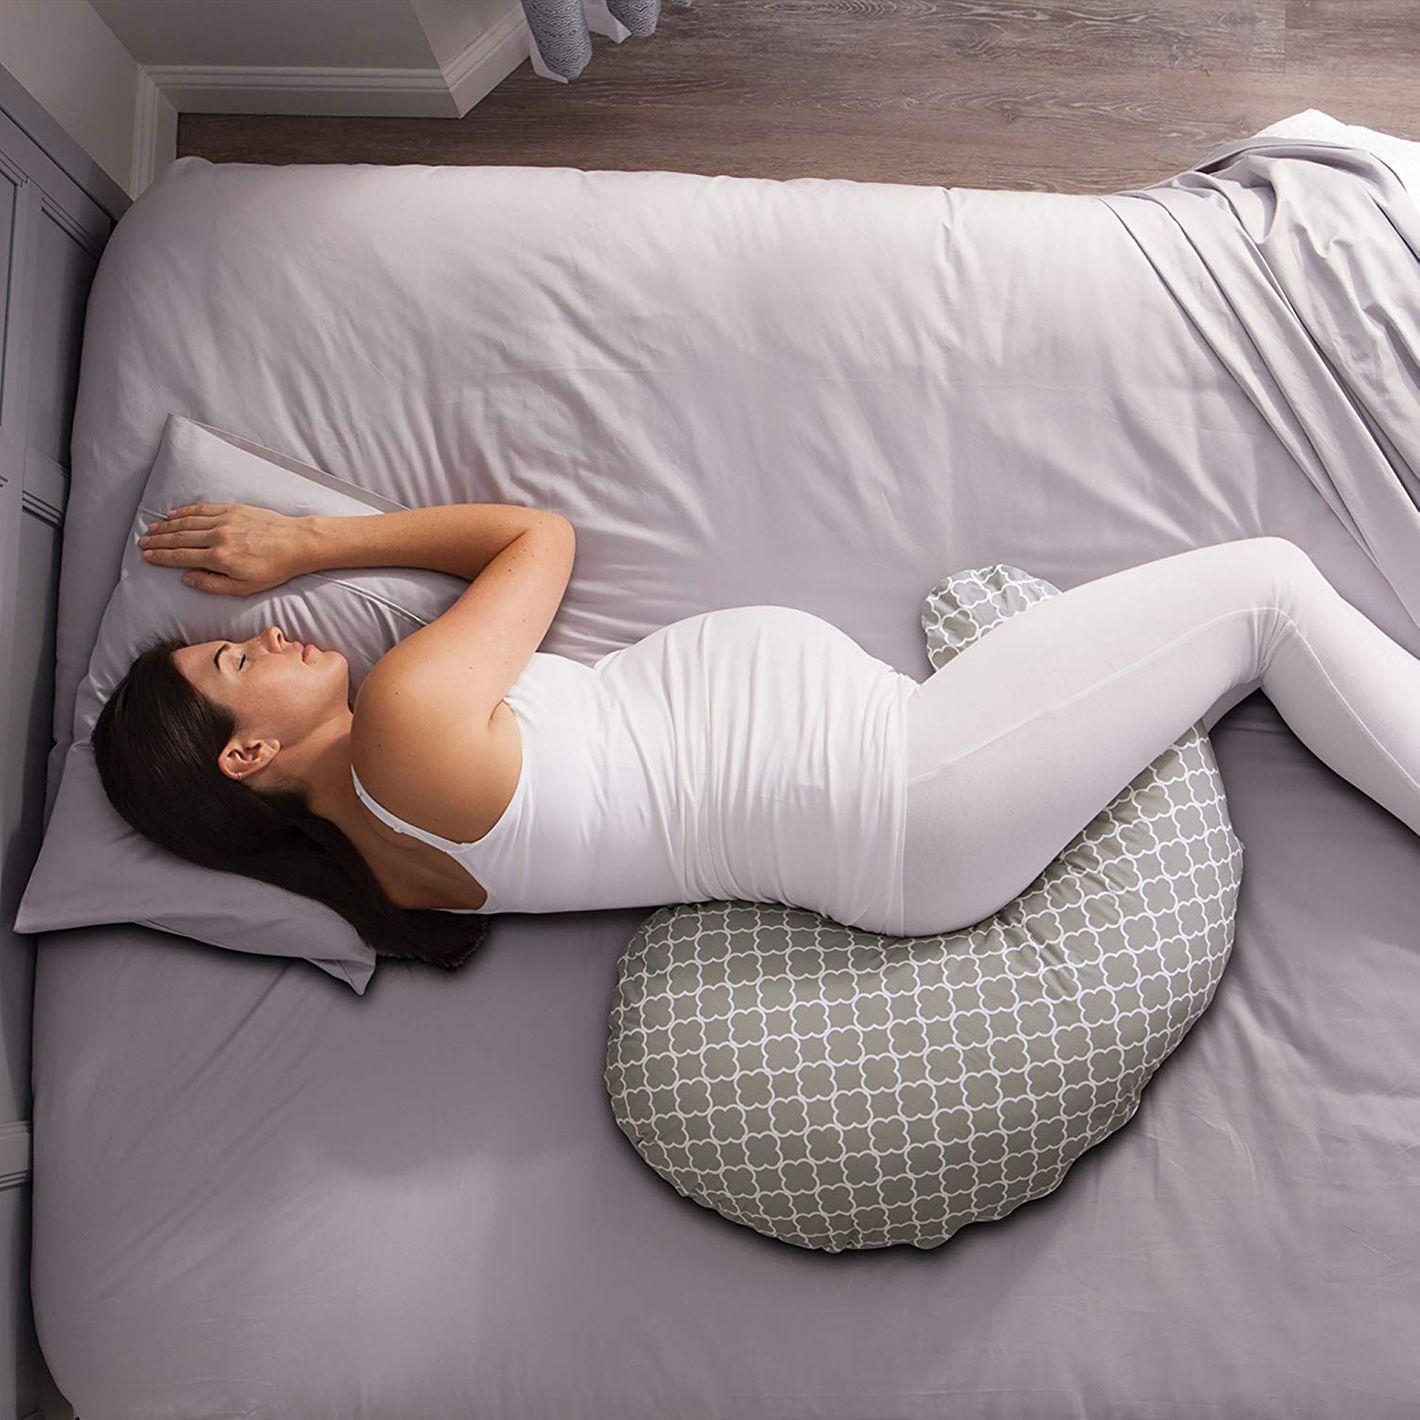 10 Best Pregnancy Pillows Reviewed 2018